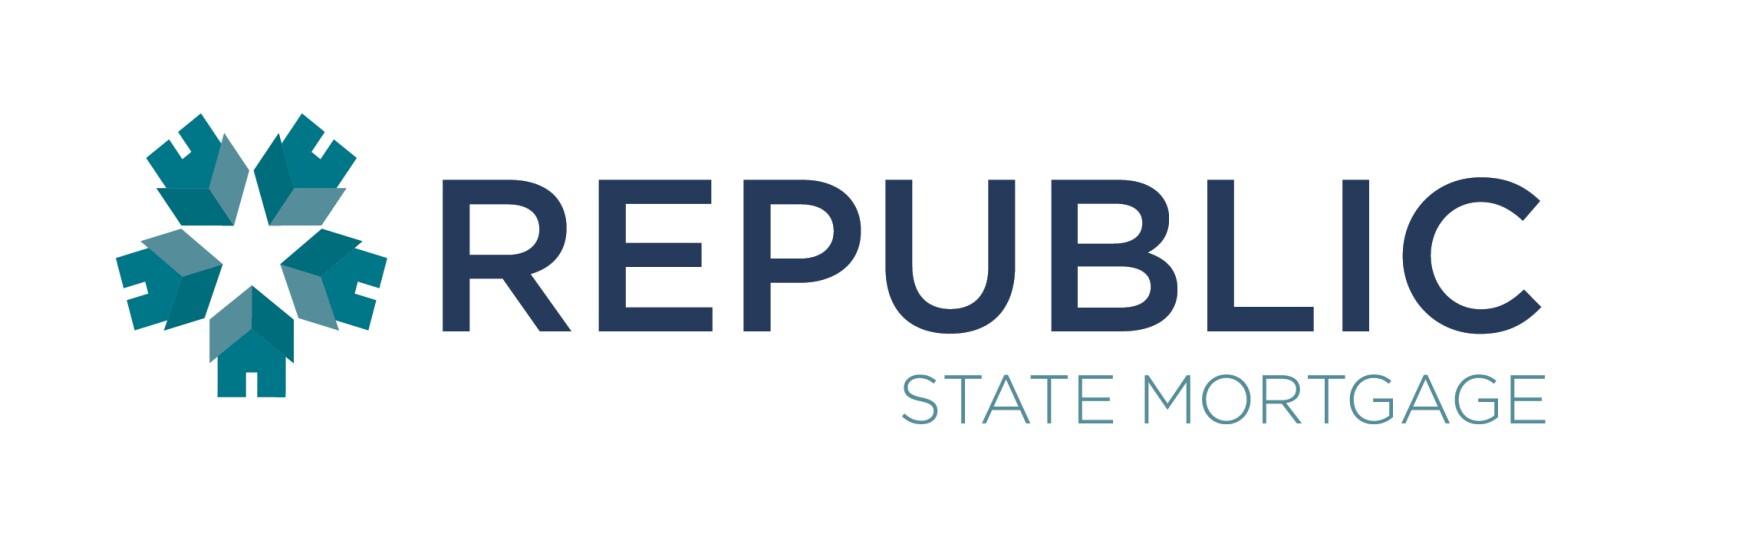 Republic State Mortgage.jpg